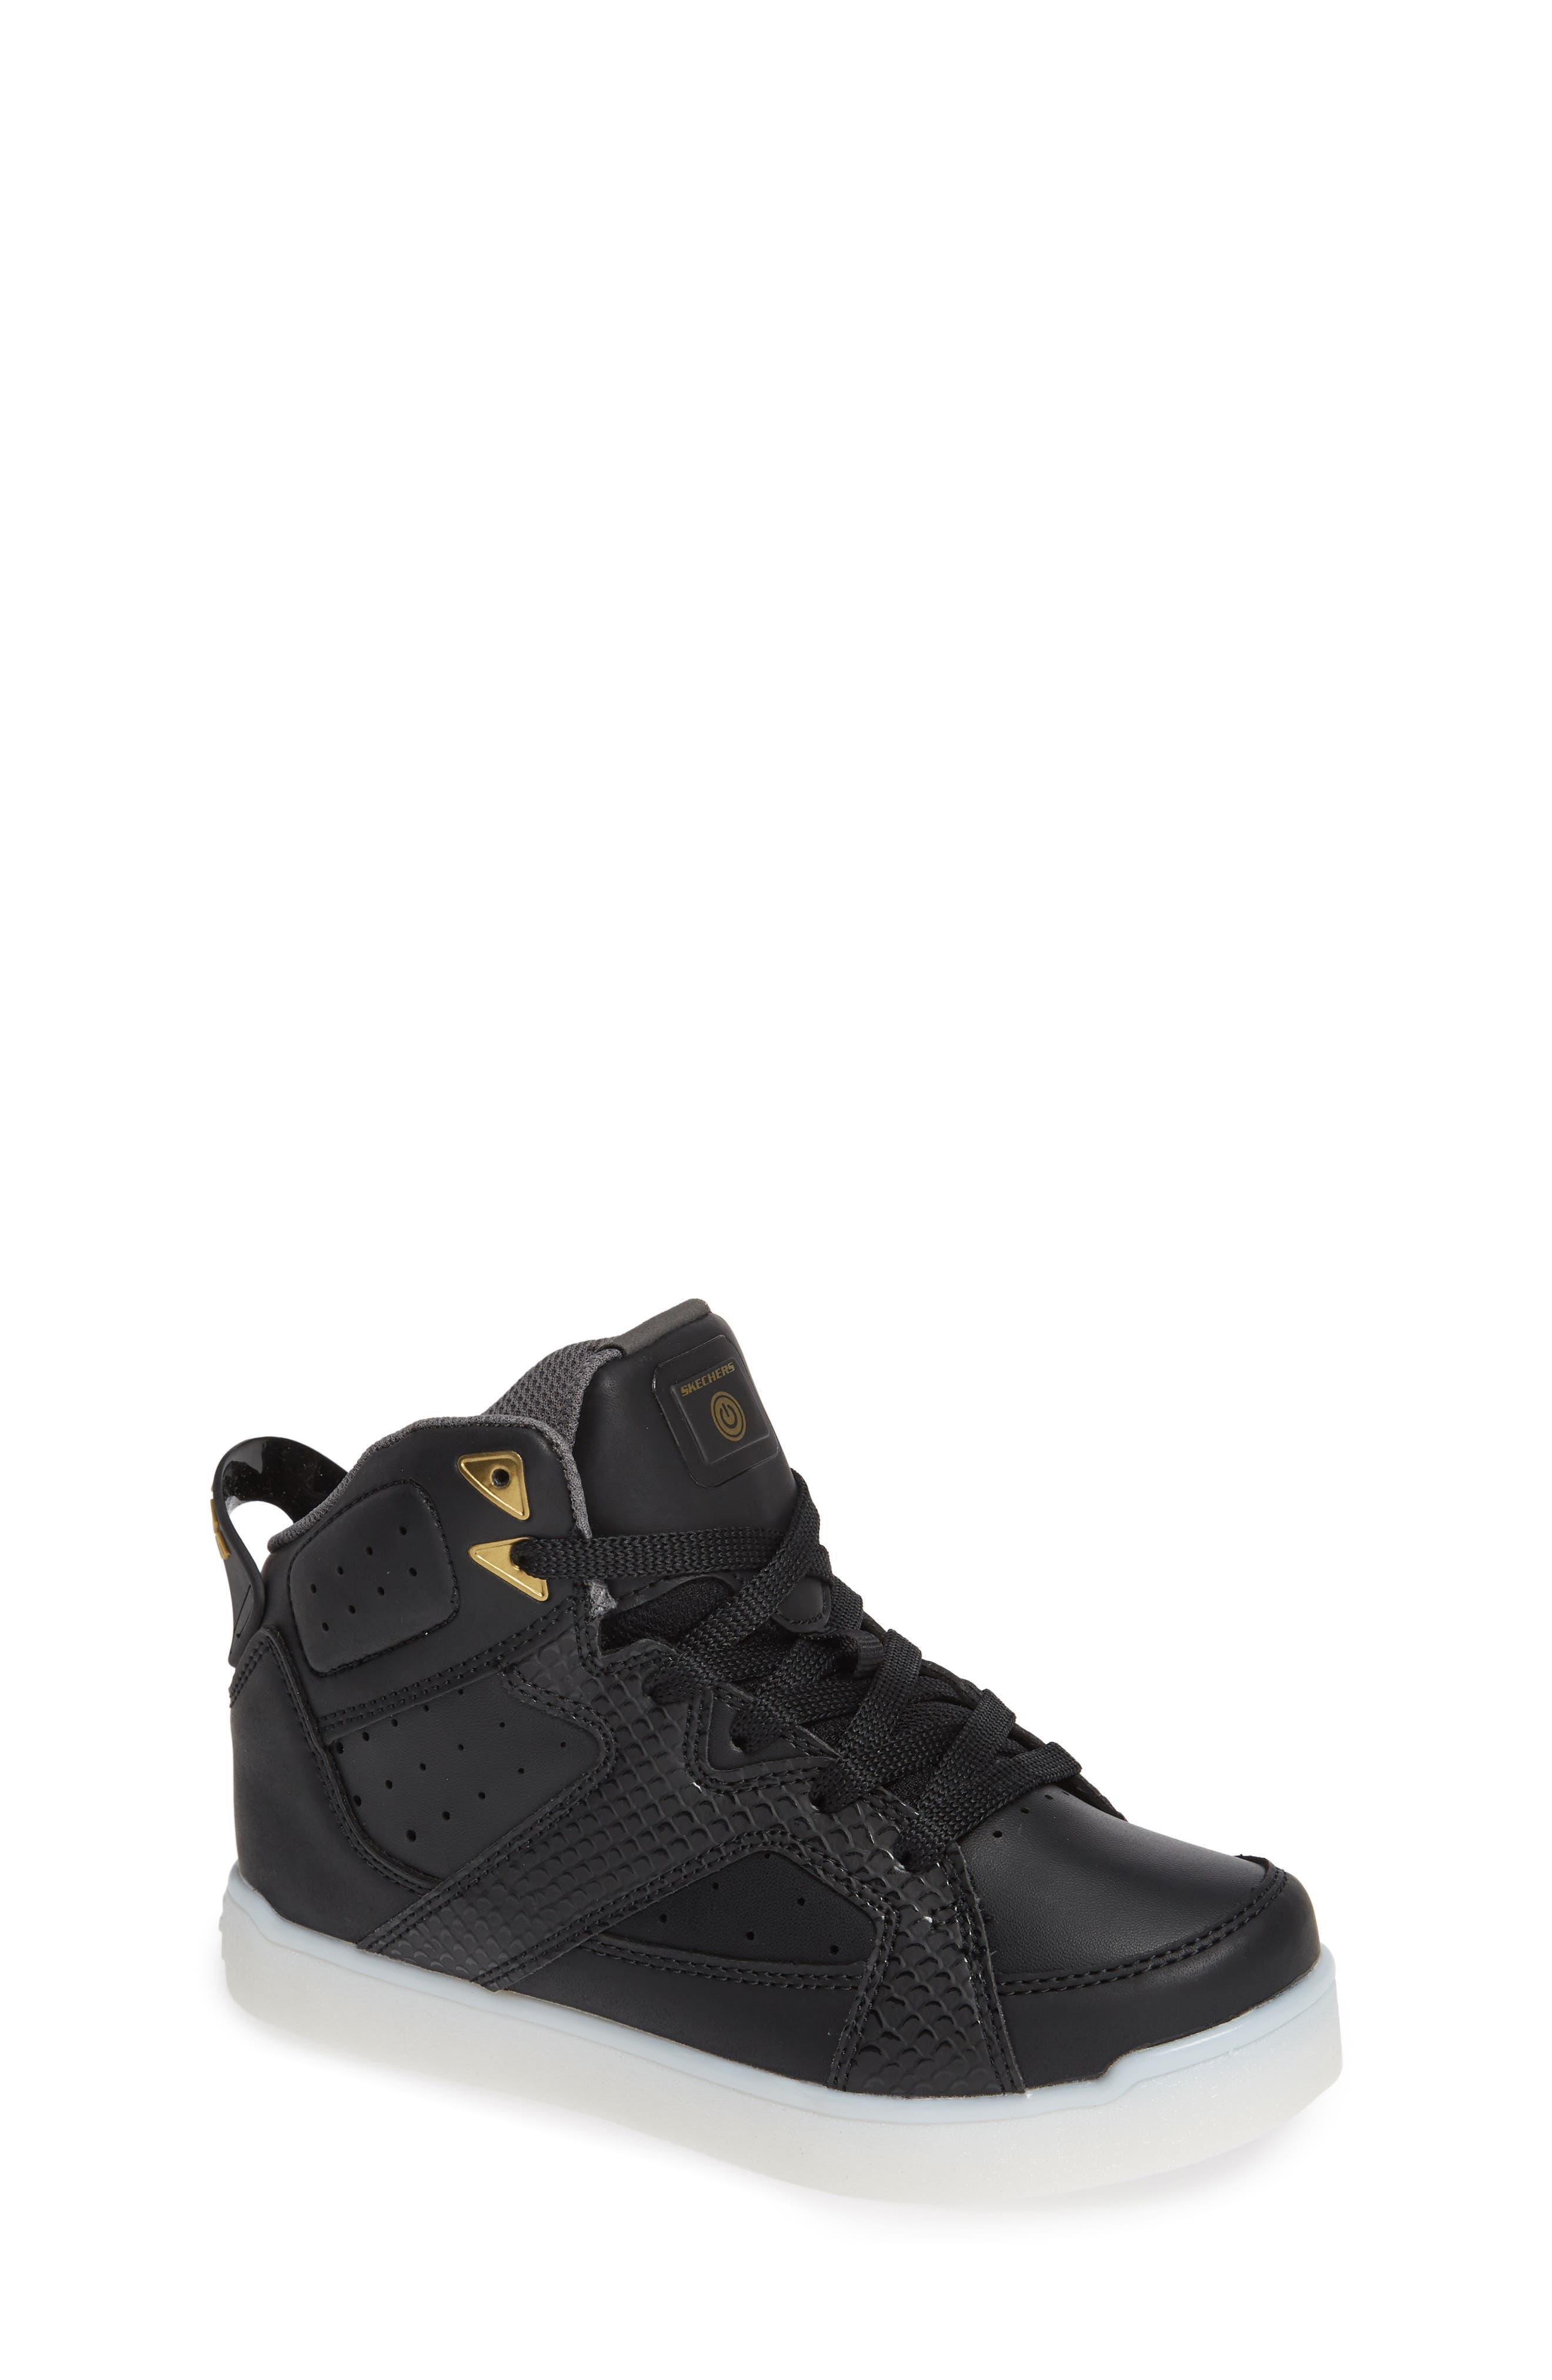 Energy Lights Pro Street Quest II Sneaker,                         Main,                         color, 017